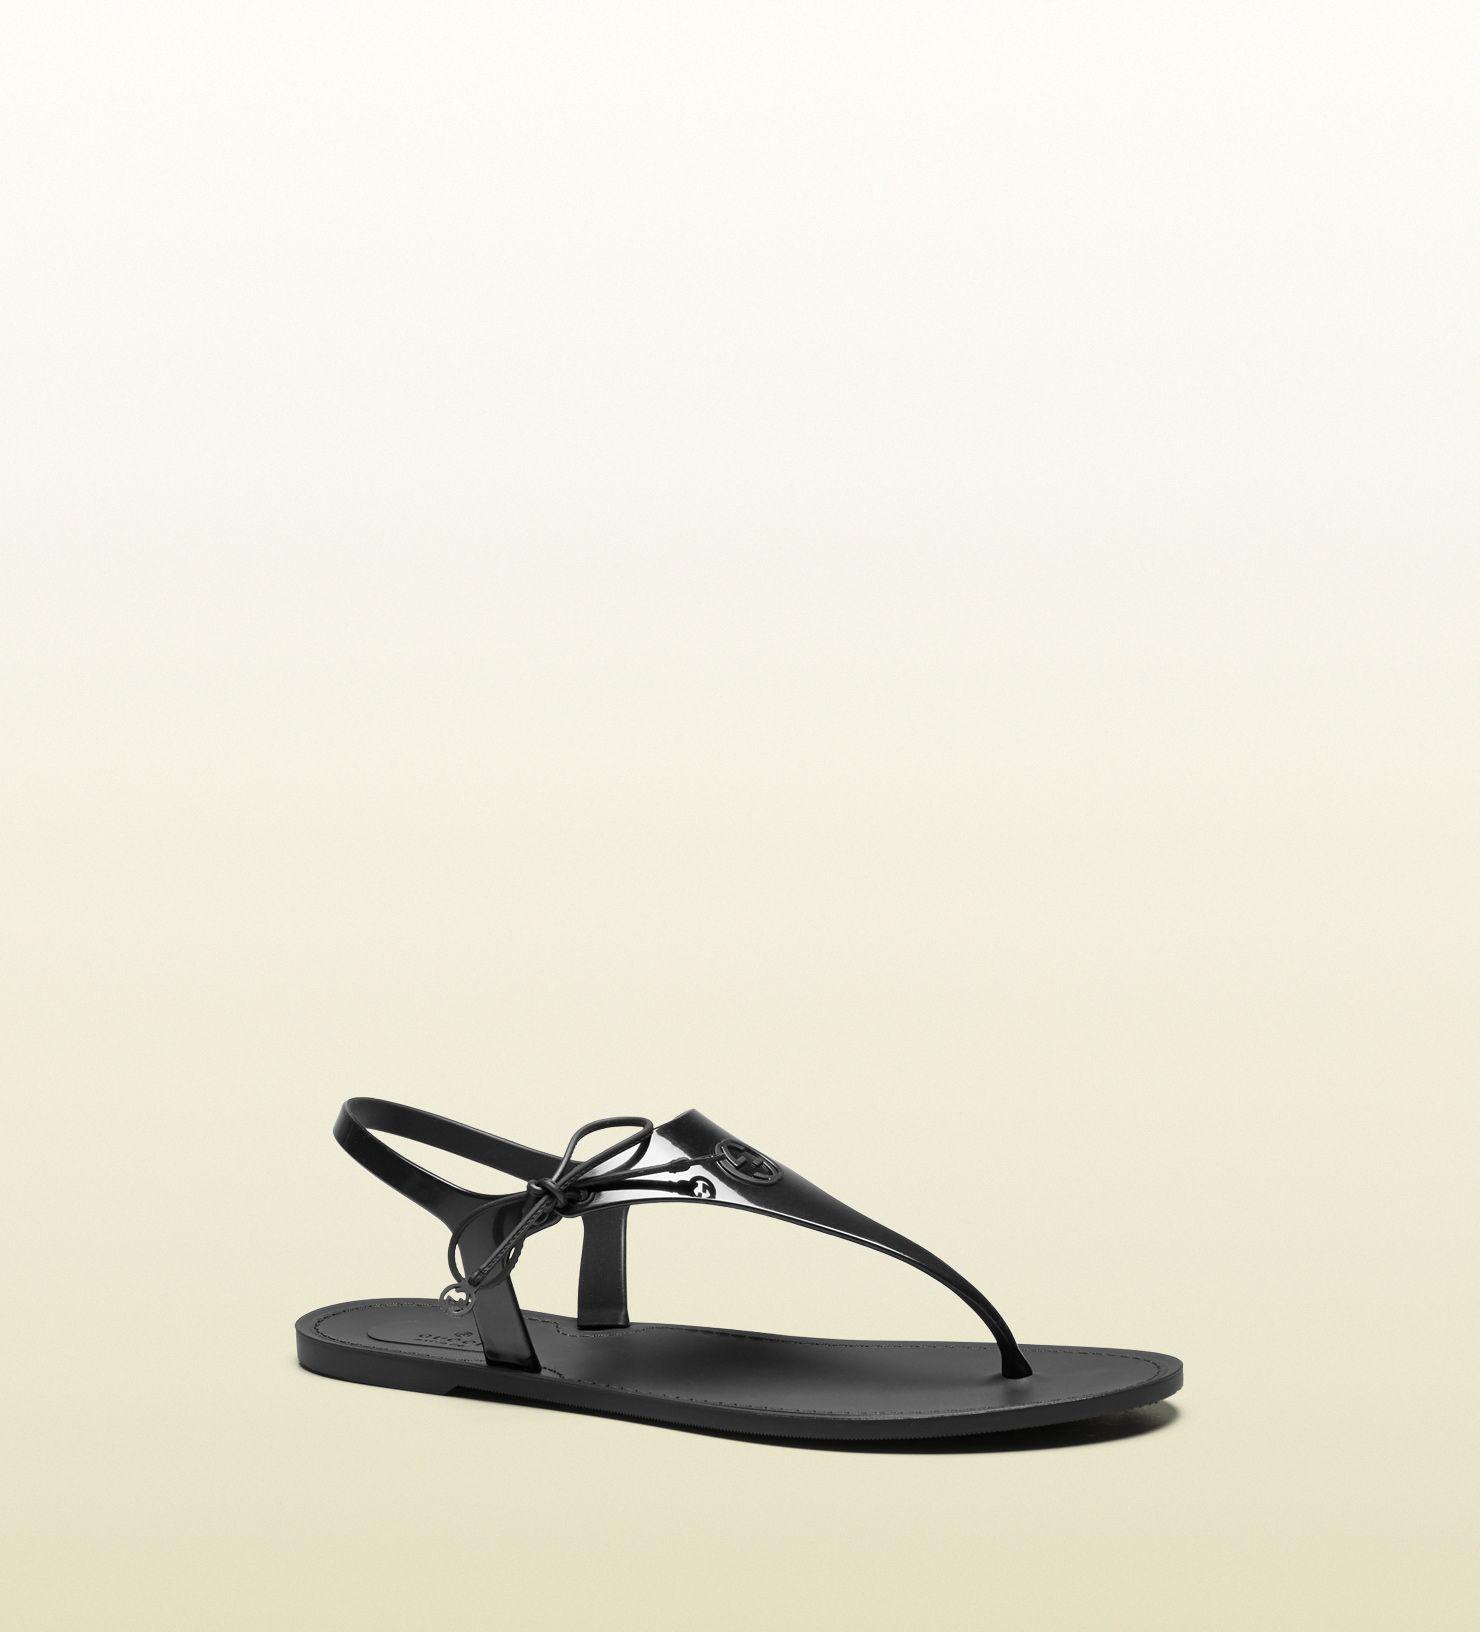 ac4b5b8bc Gucci katina bio-plastic rubber thong sandal | shoe shoes shoes ...